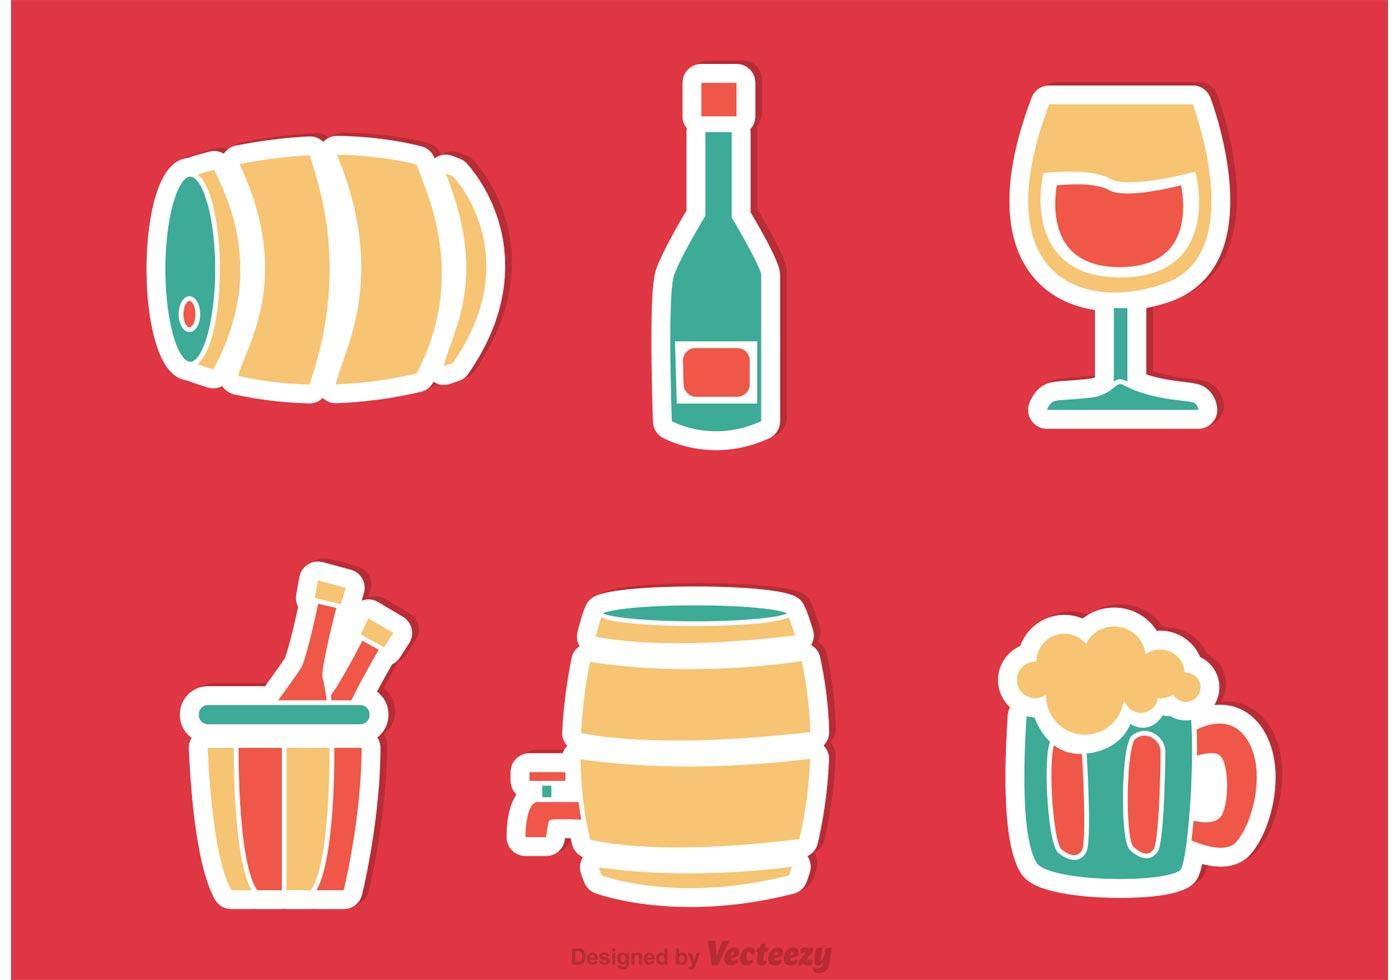 Alcohol Sticker Vectors - Download Free Vector Art, Stock ...